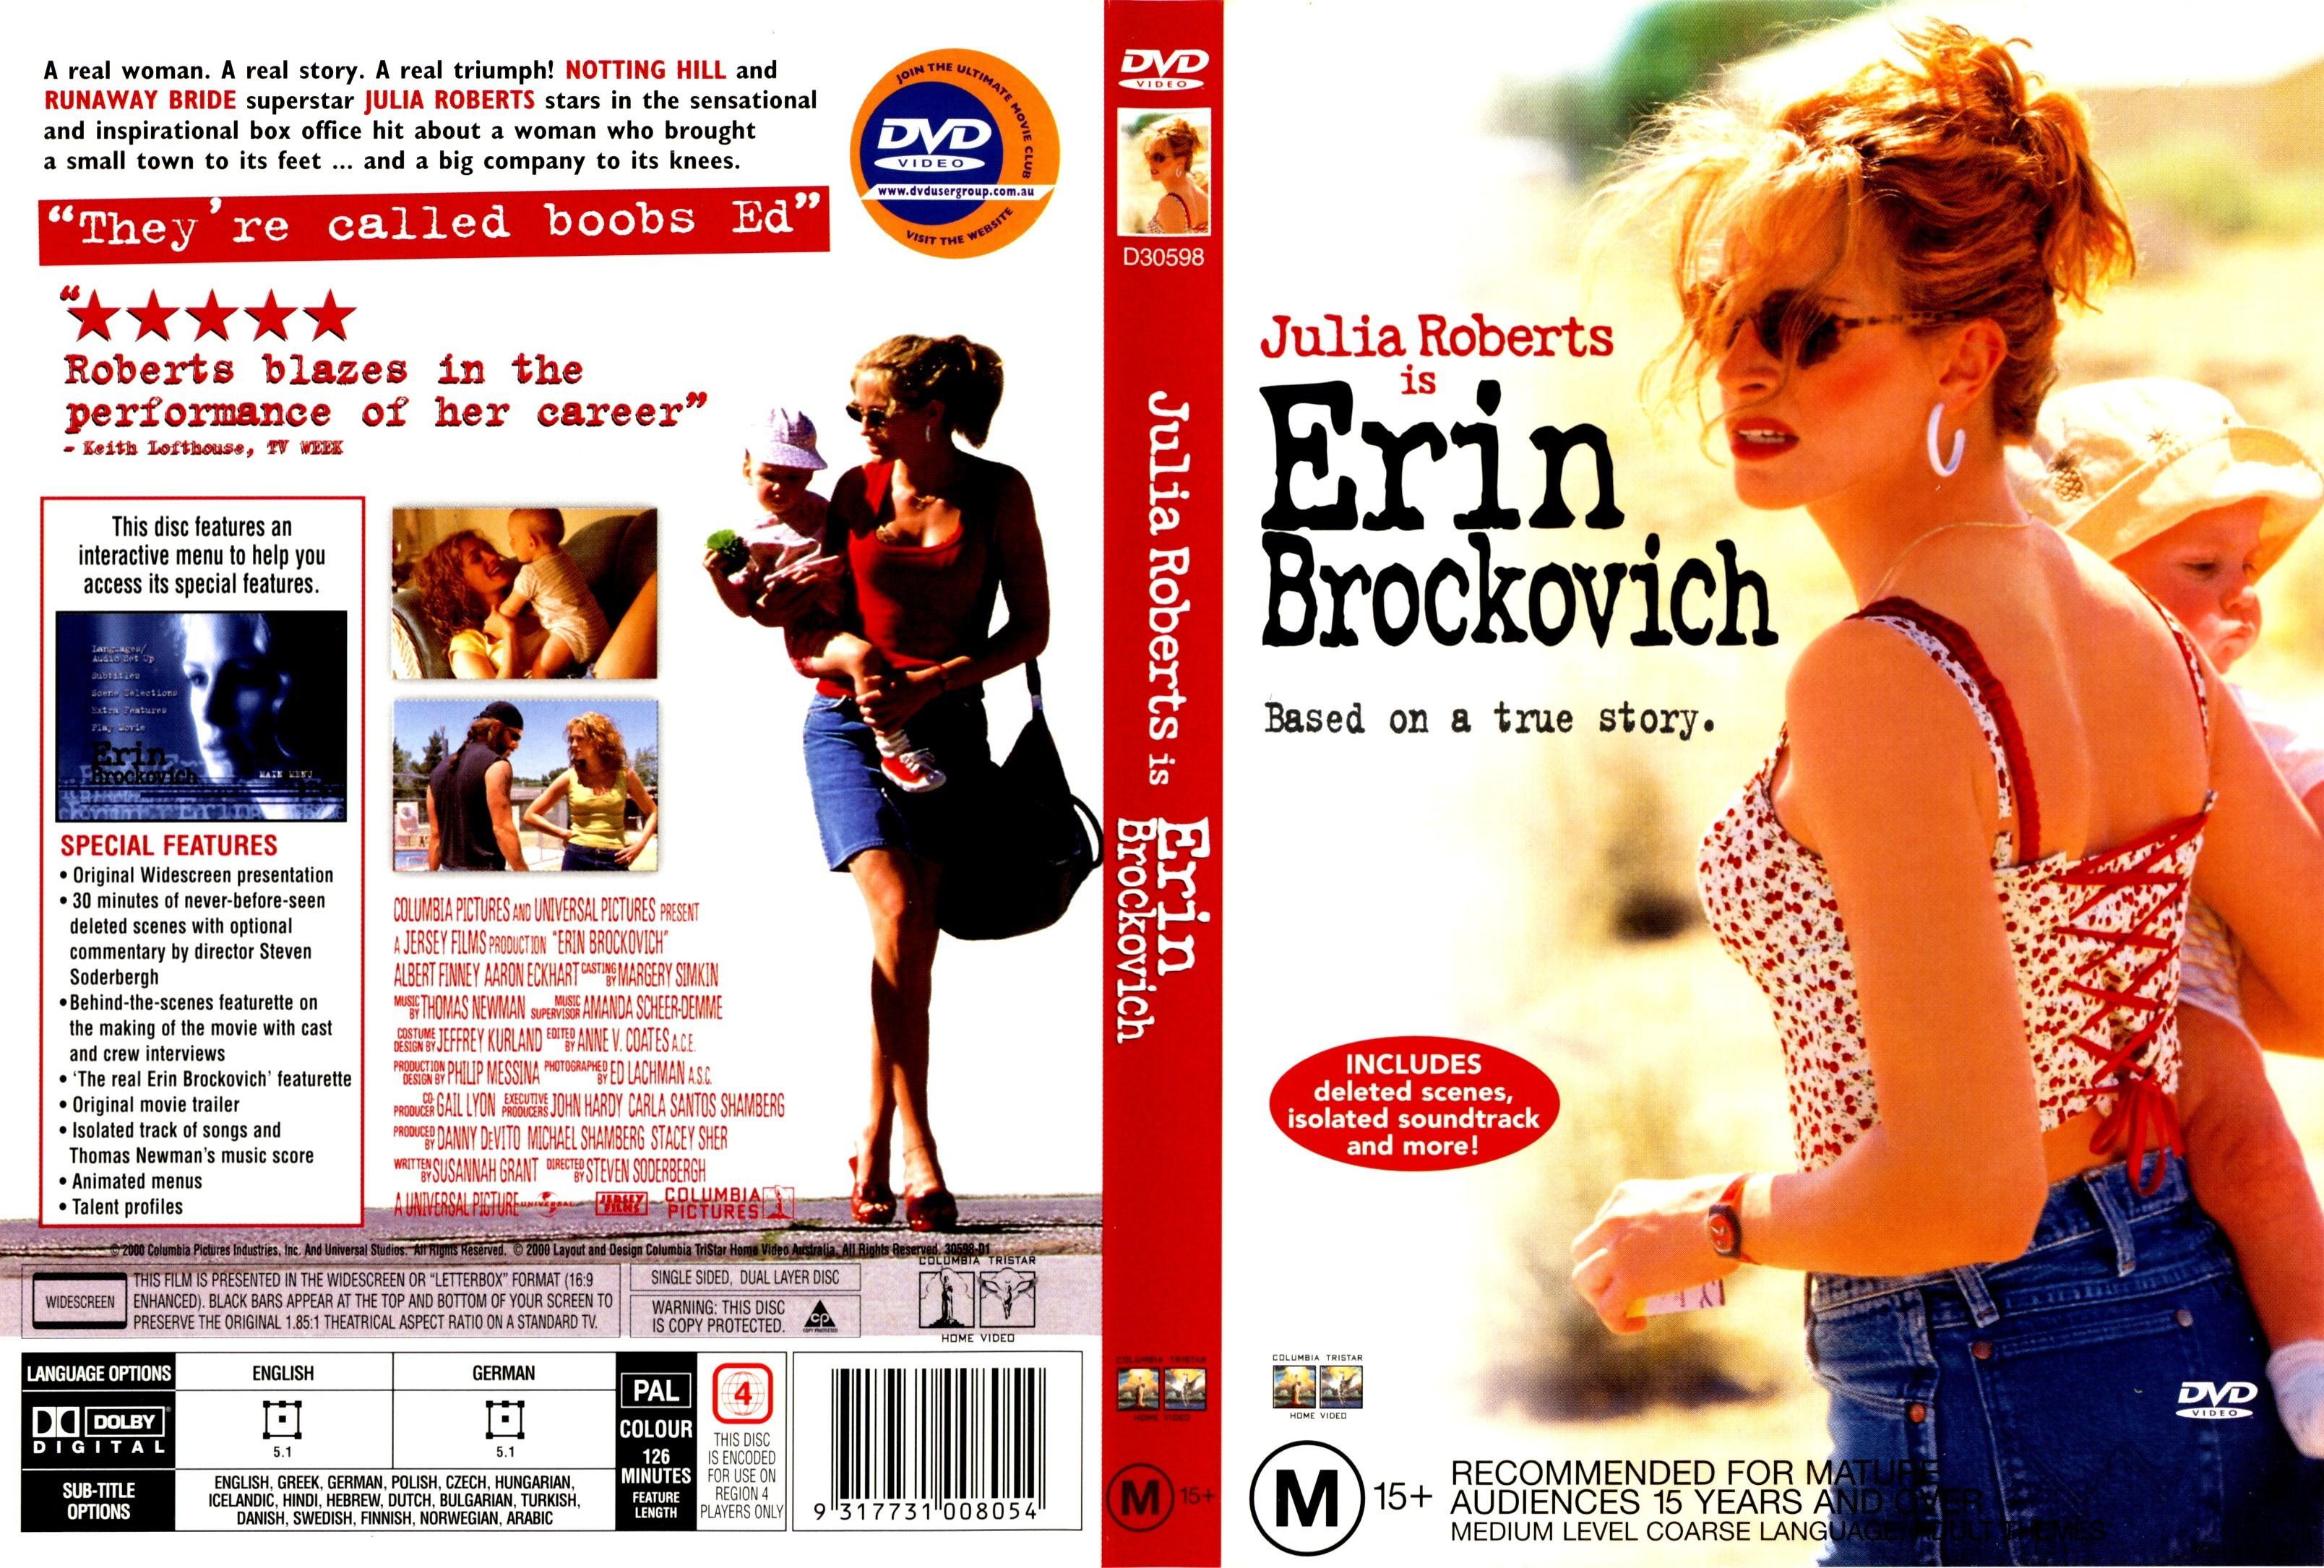 Erin brockovich movie movies gif on gifer by sterndragon.